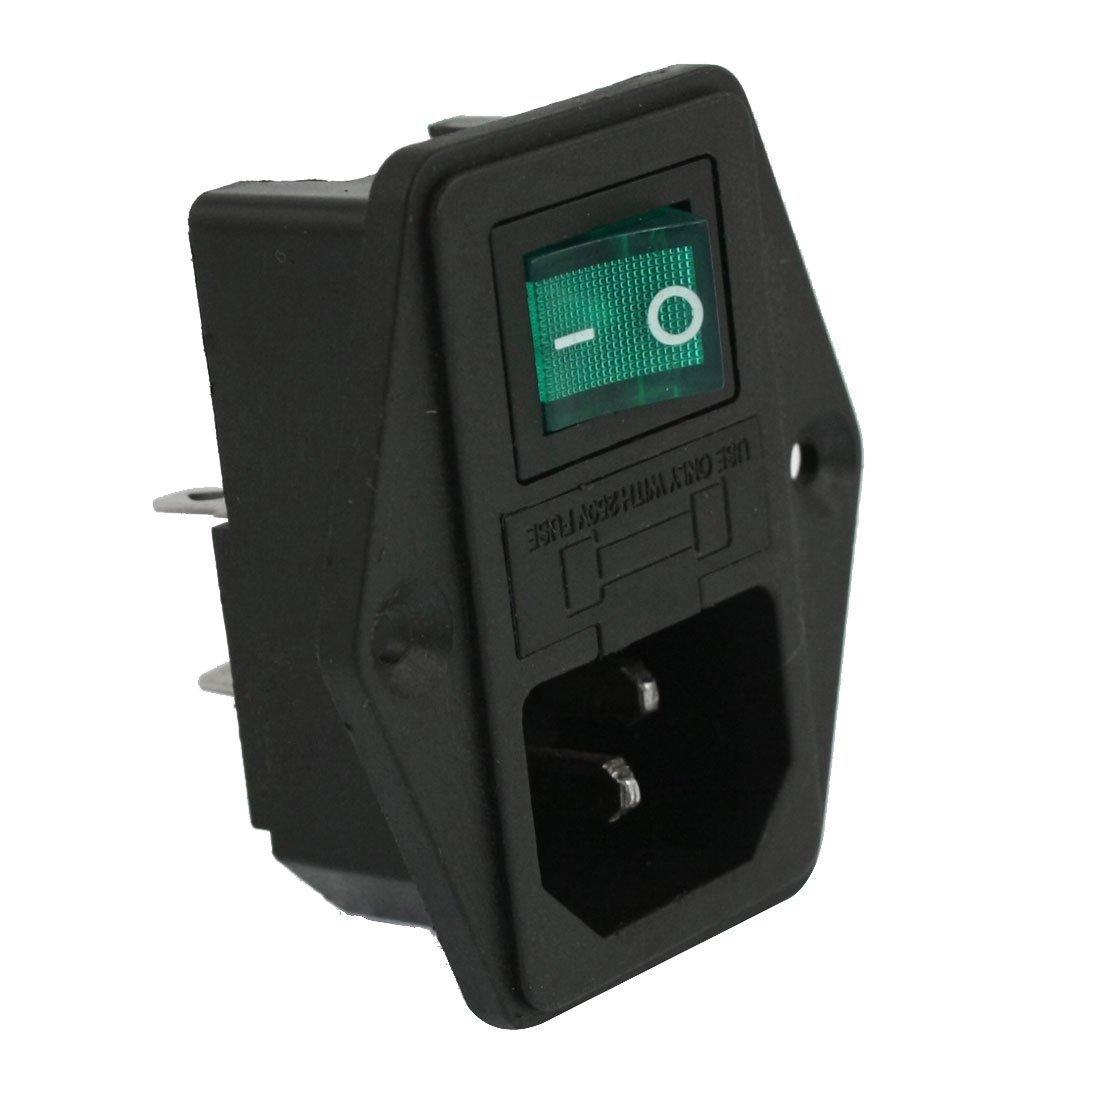 Amazon.com: TOOGOO(R) AC 10A 250V IEC320 C14 Inlet Module Plug Neno Lamp  Boat Switch: Home Improvement